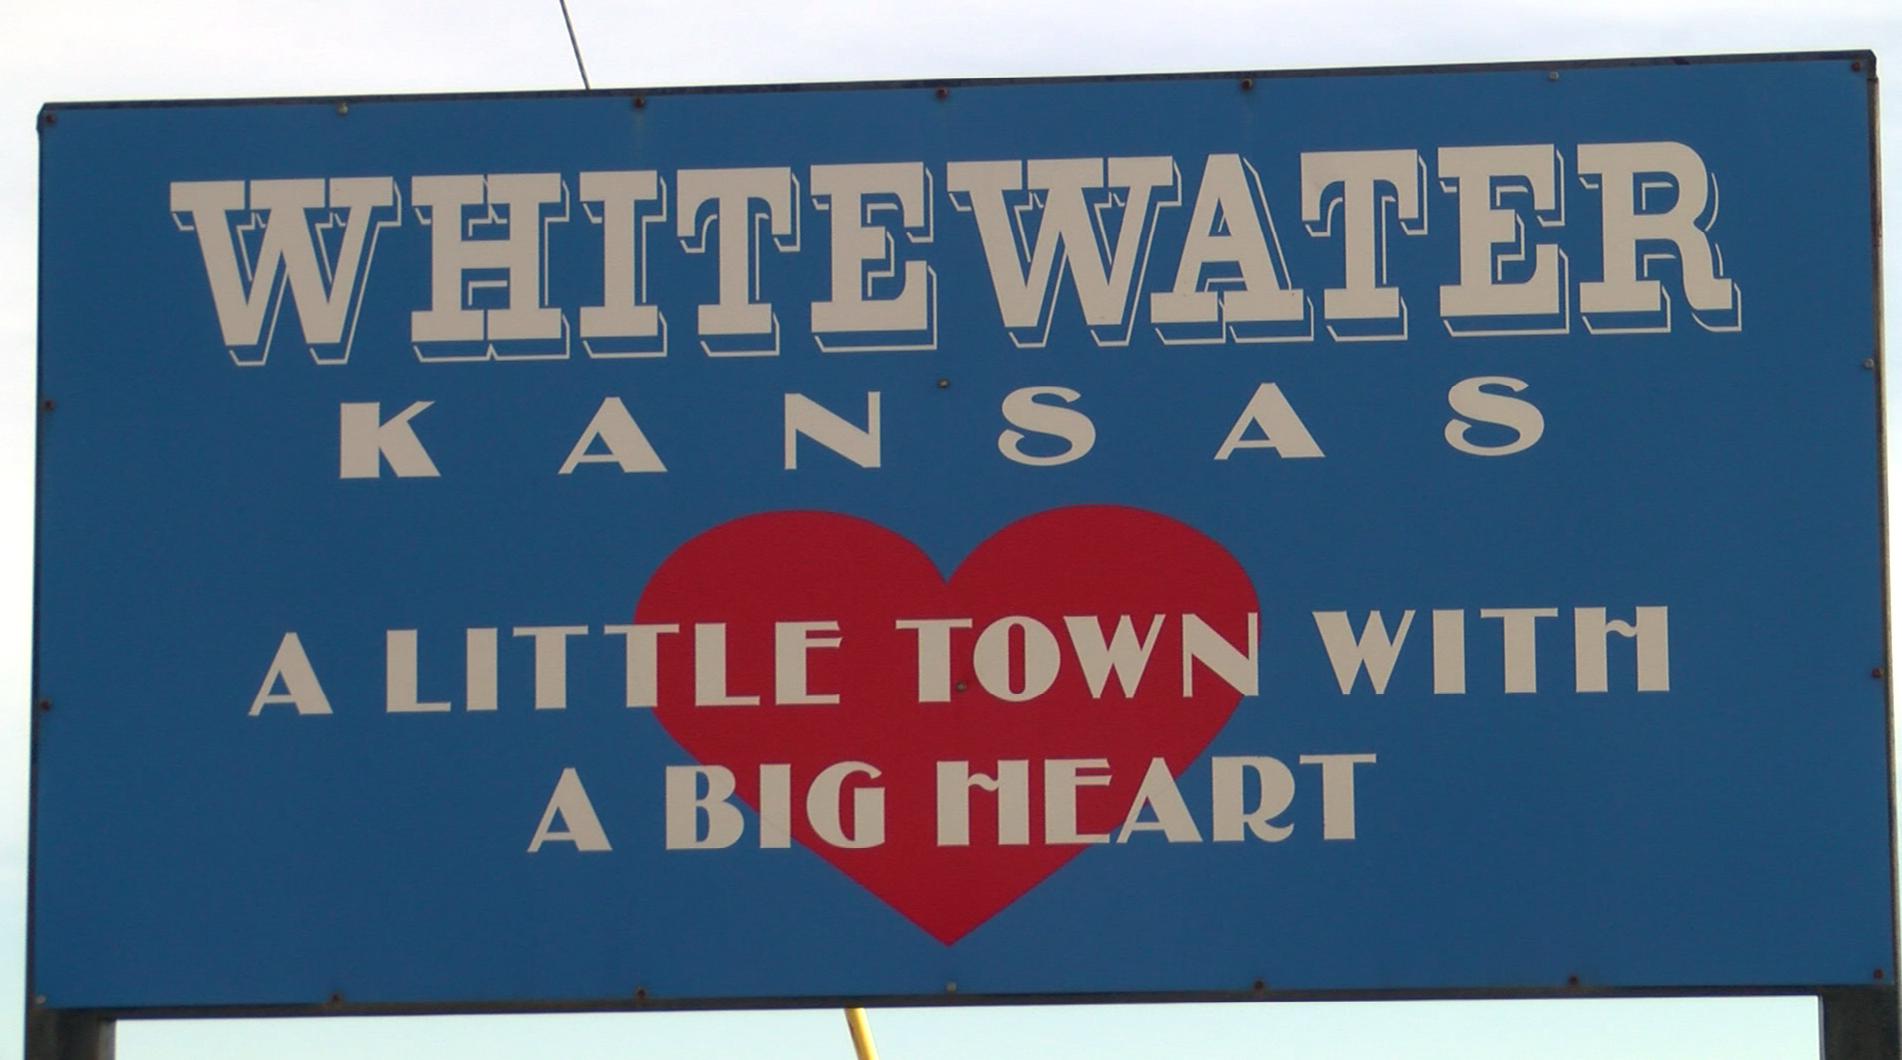 Main Street Kansas: 89-year-old waitress puts 'mom' in Mom's